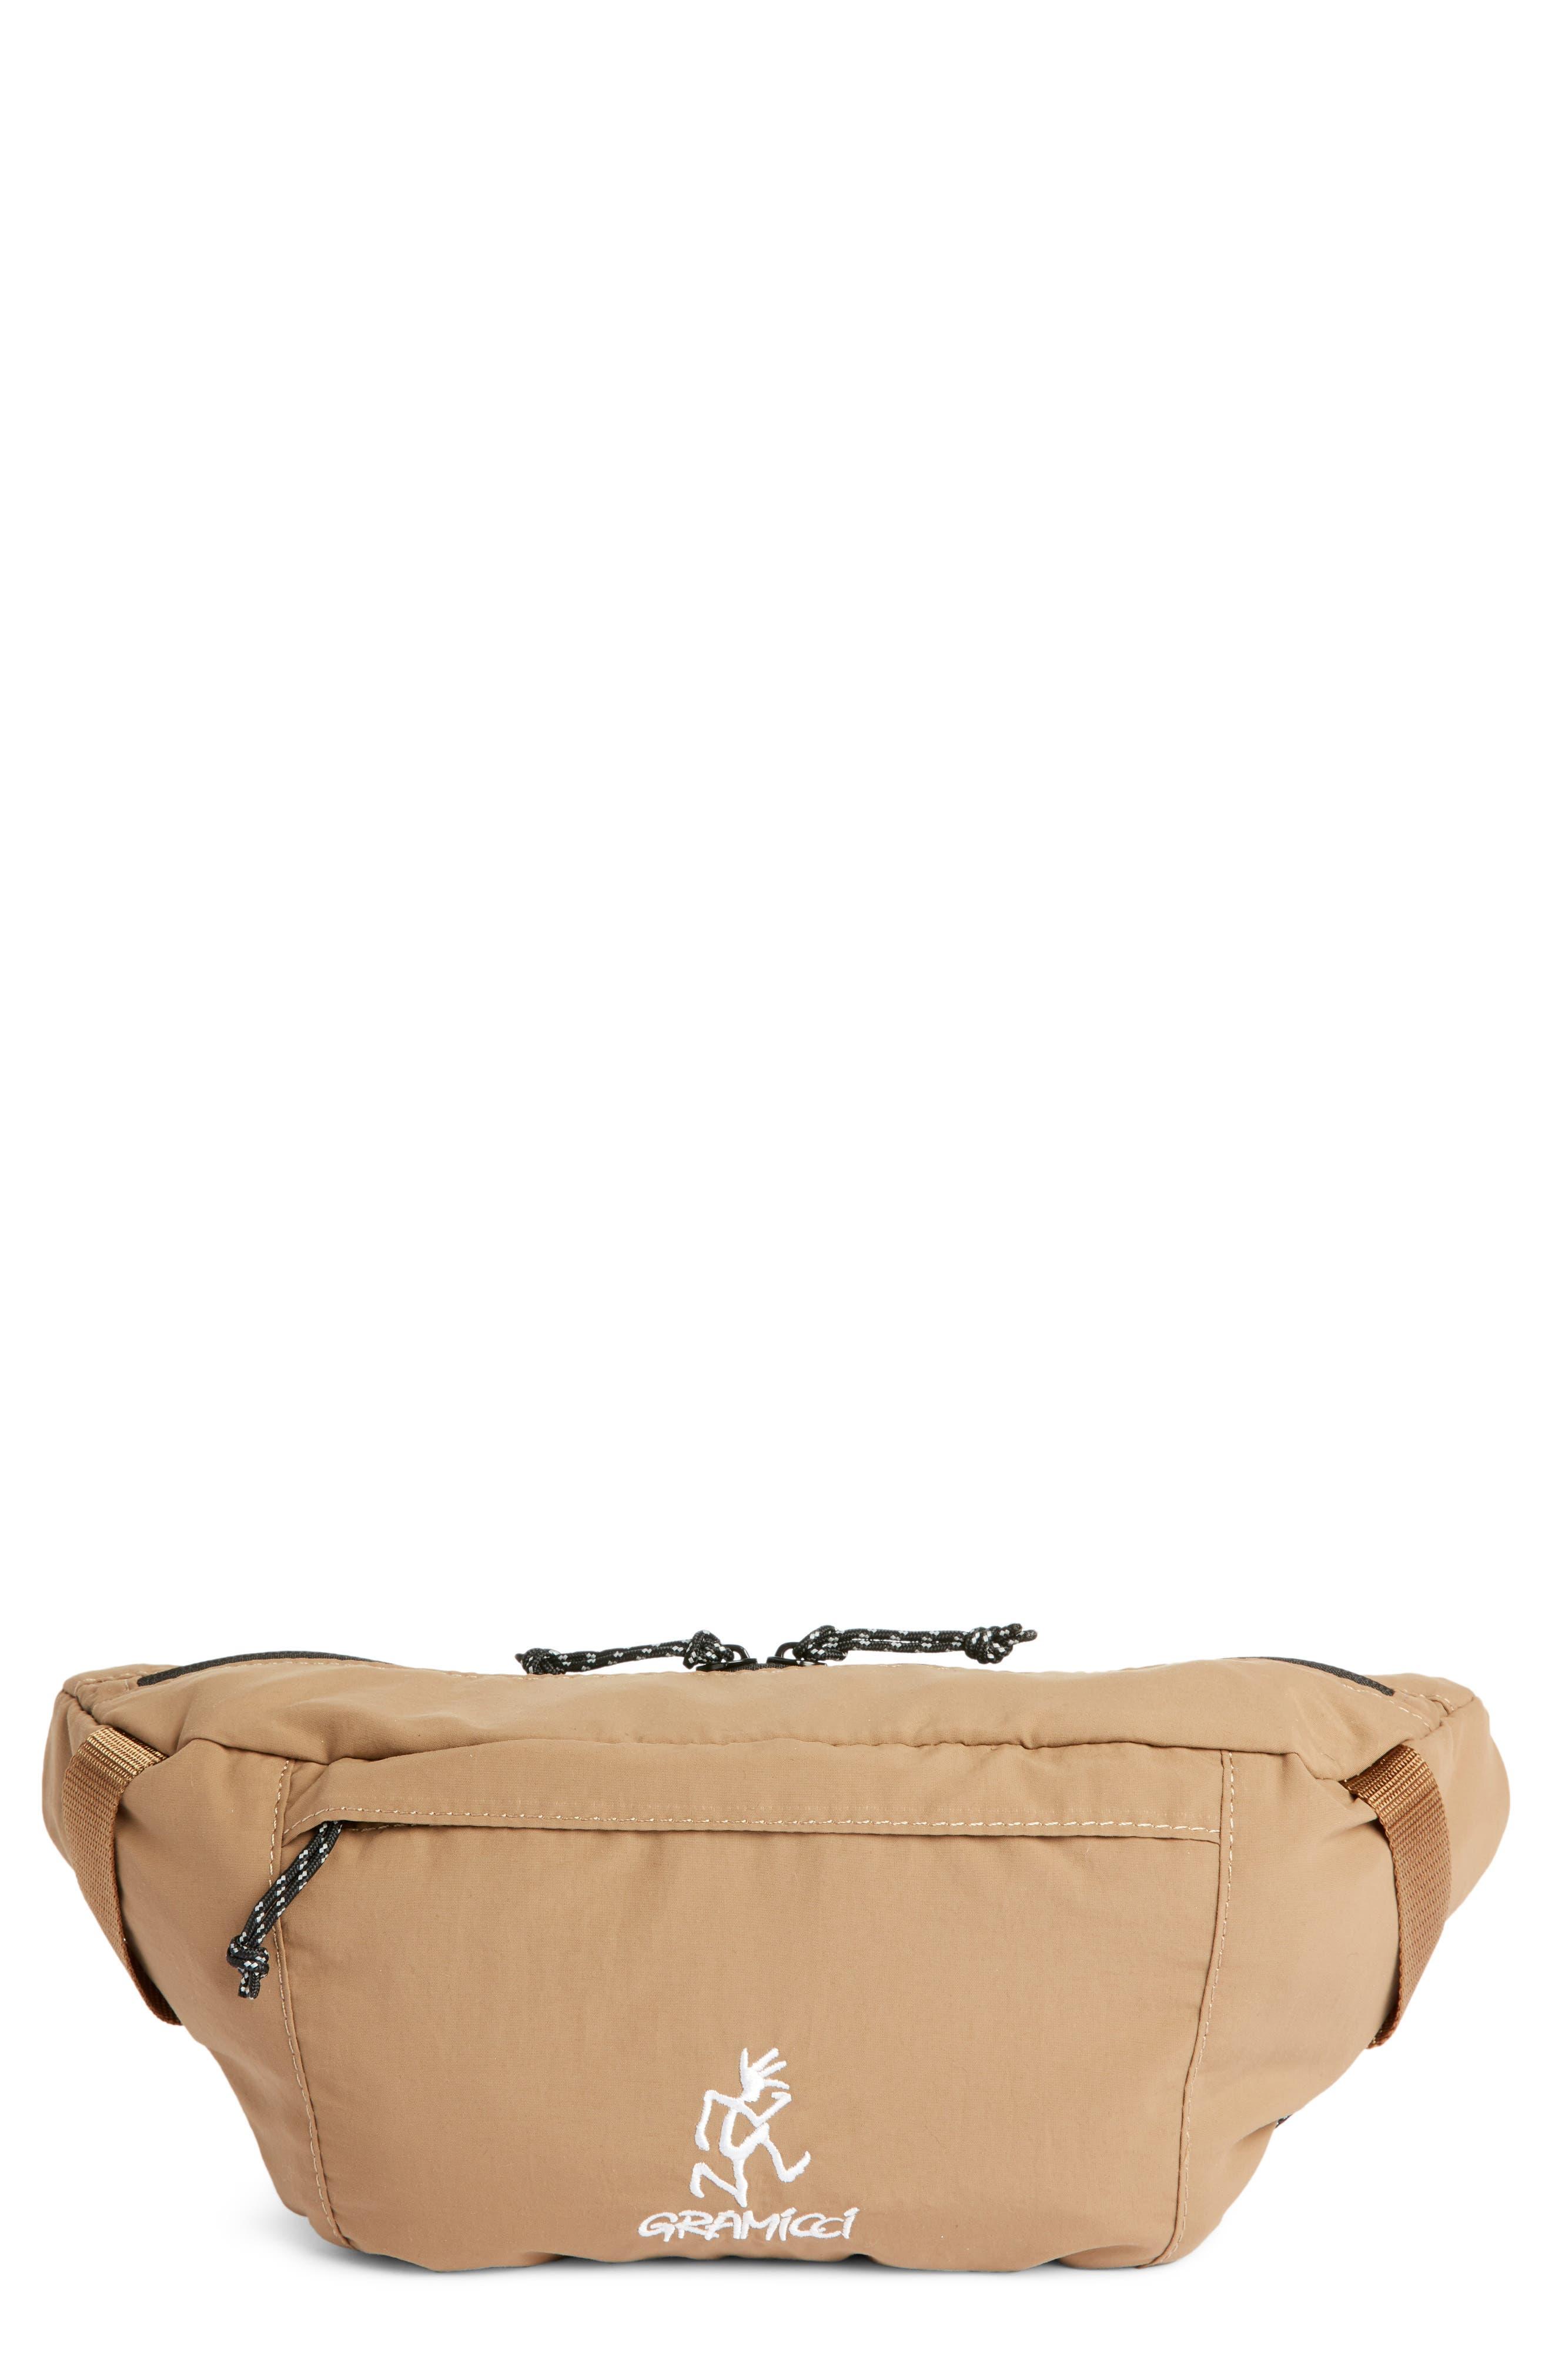 Body Belt Bag